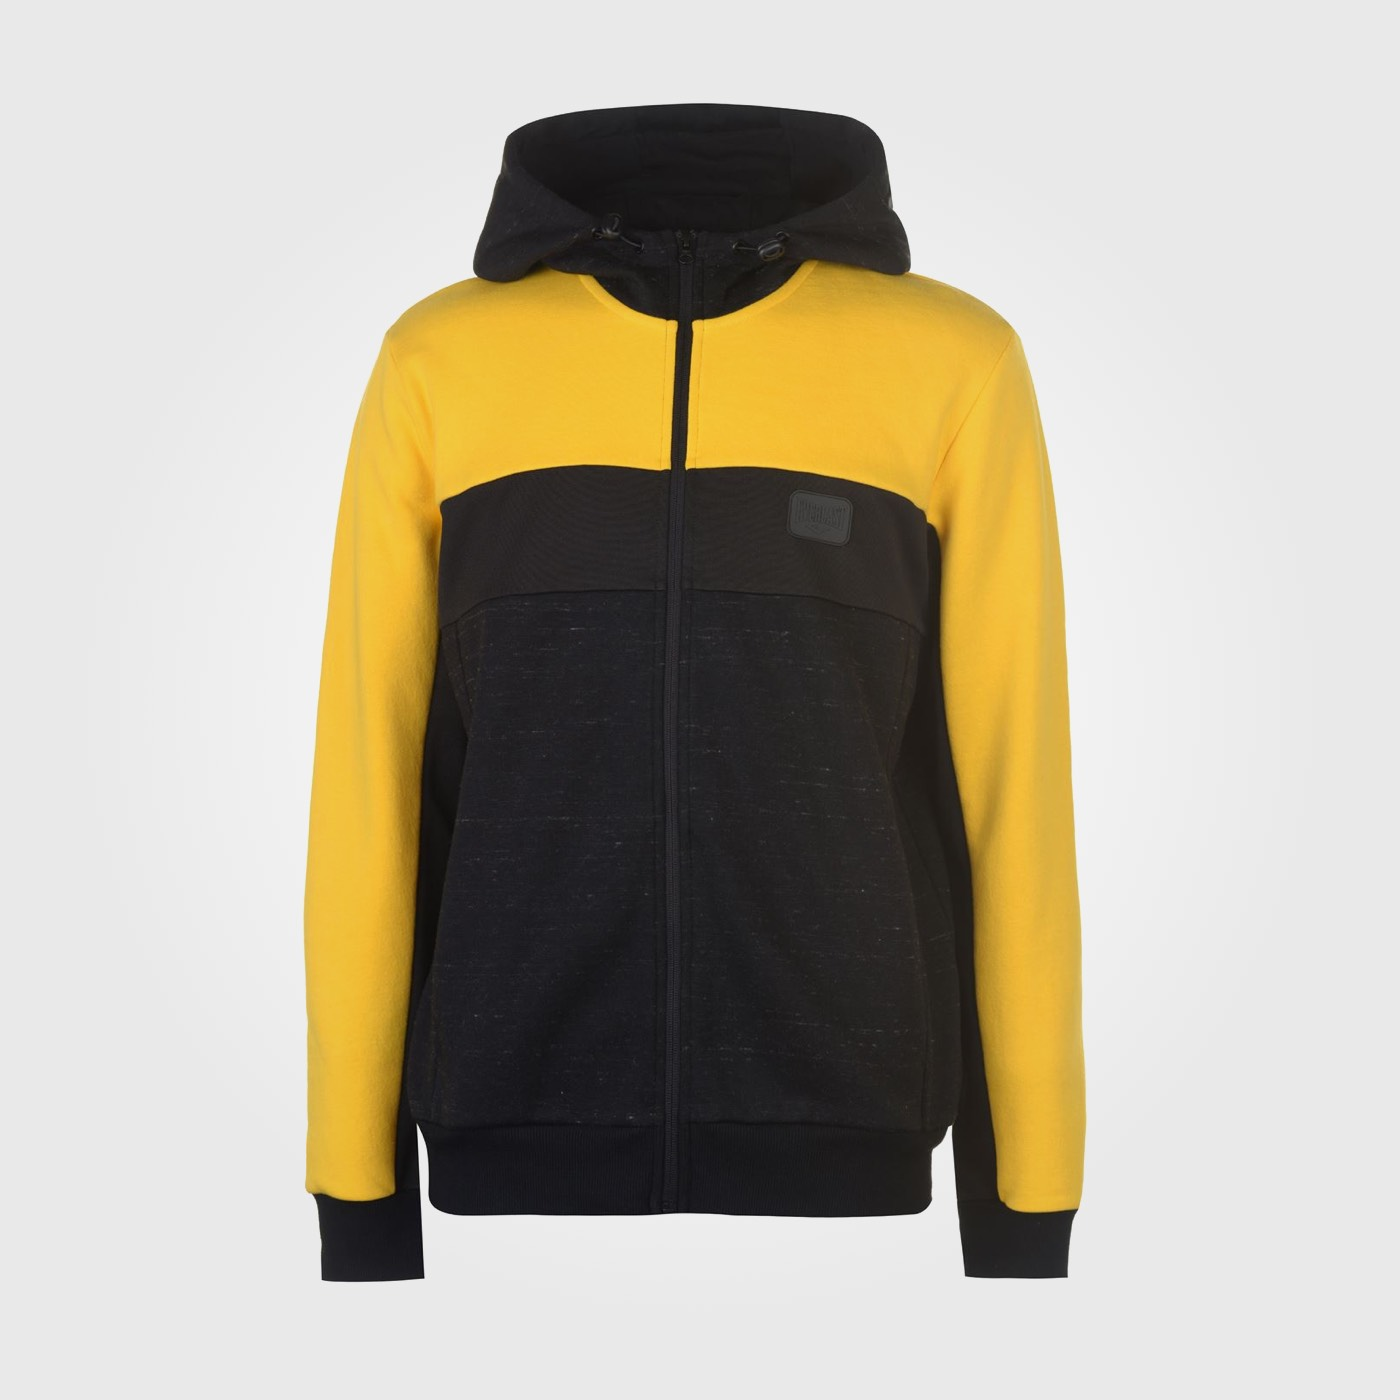 Толстовка Everlast Bronx Zip Hoody Mens Black/Yellow